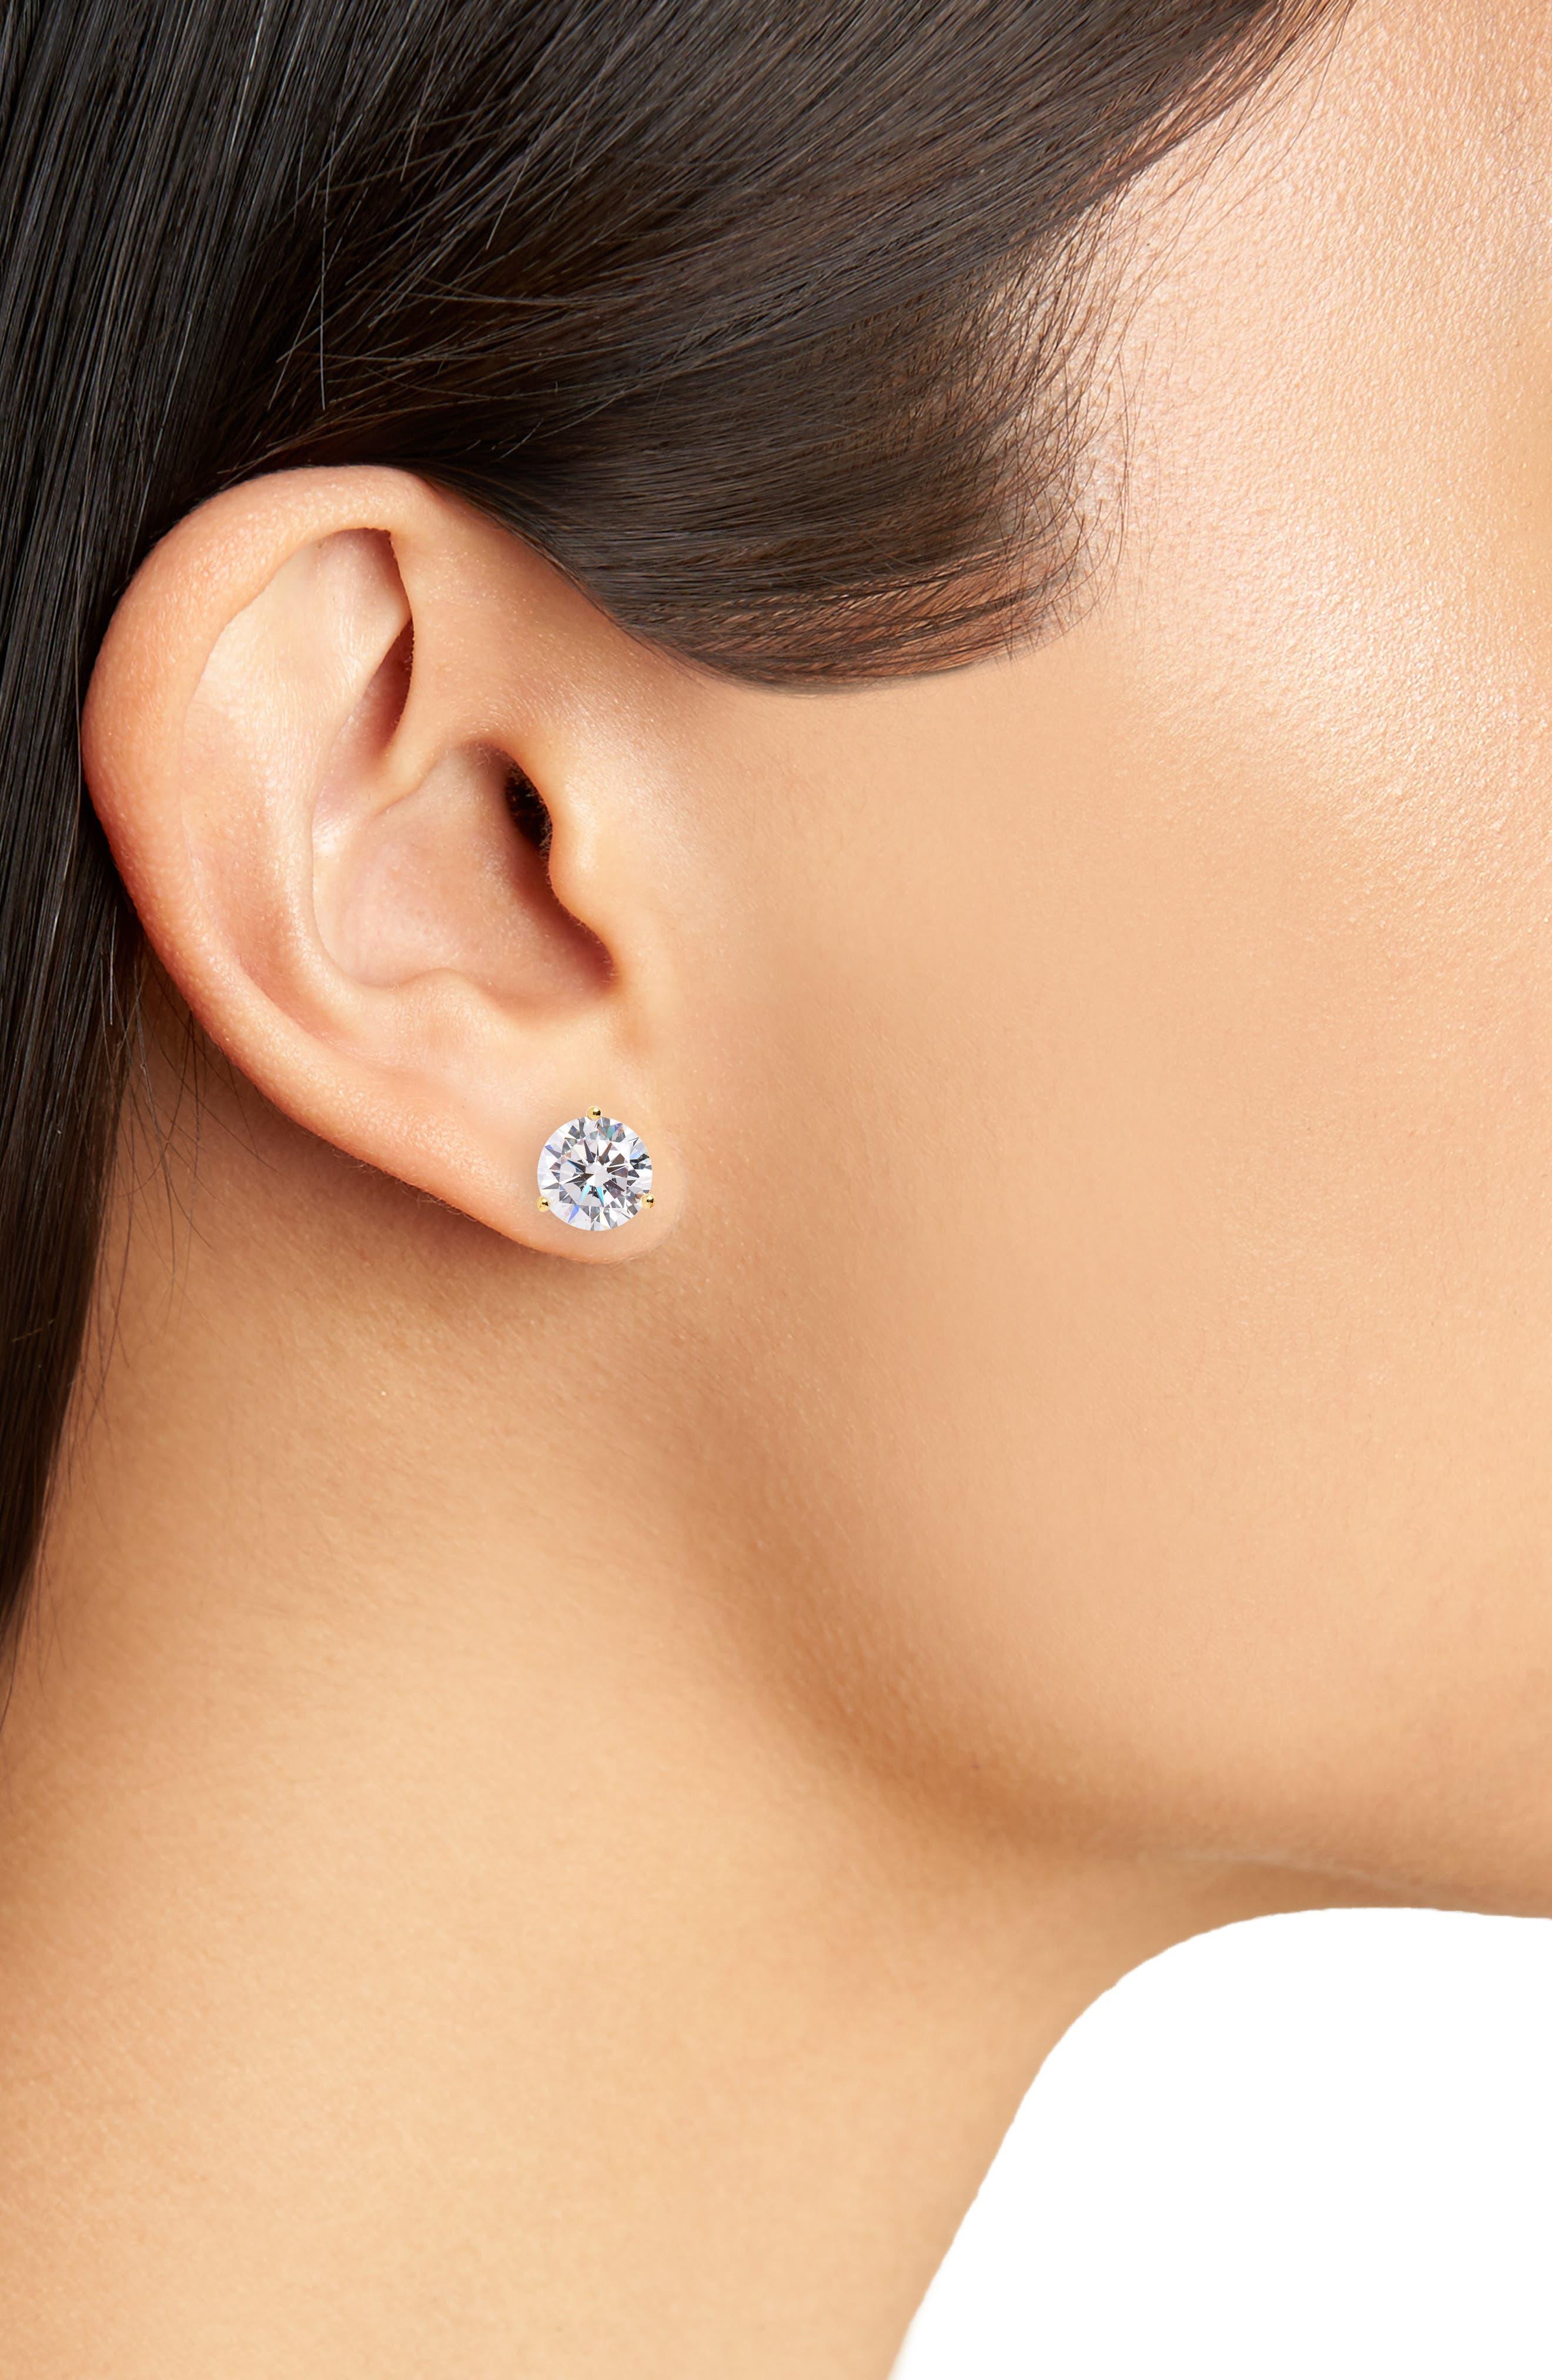 6ct tw Cubic Zirconia Earrings,                             Alternate thumbnail 3, color,                             PLATINUM